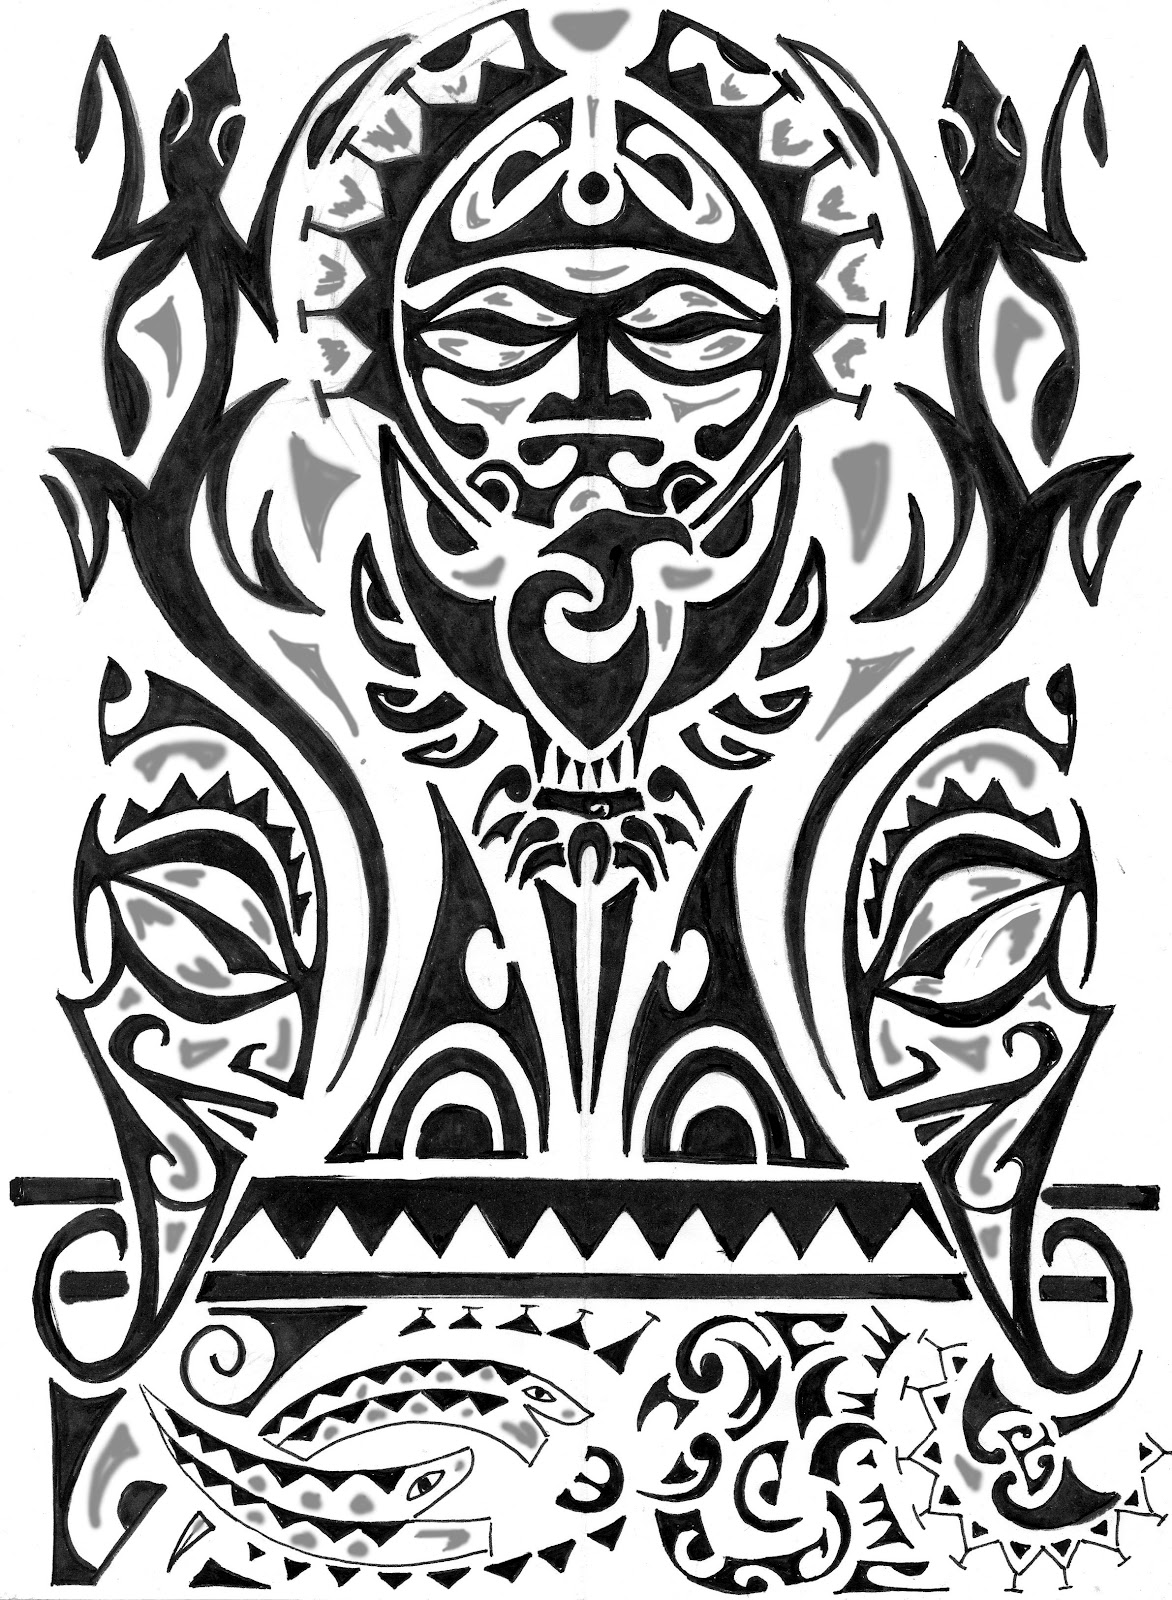 pin foto guerriero tatuaggi tattoo ultras juventus tifo calcio football on pinterest. Black Bedroom Furniture Sets. Home Design Ideas